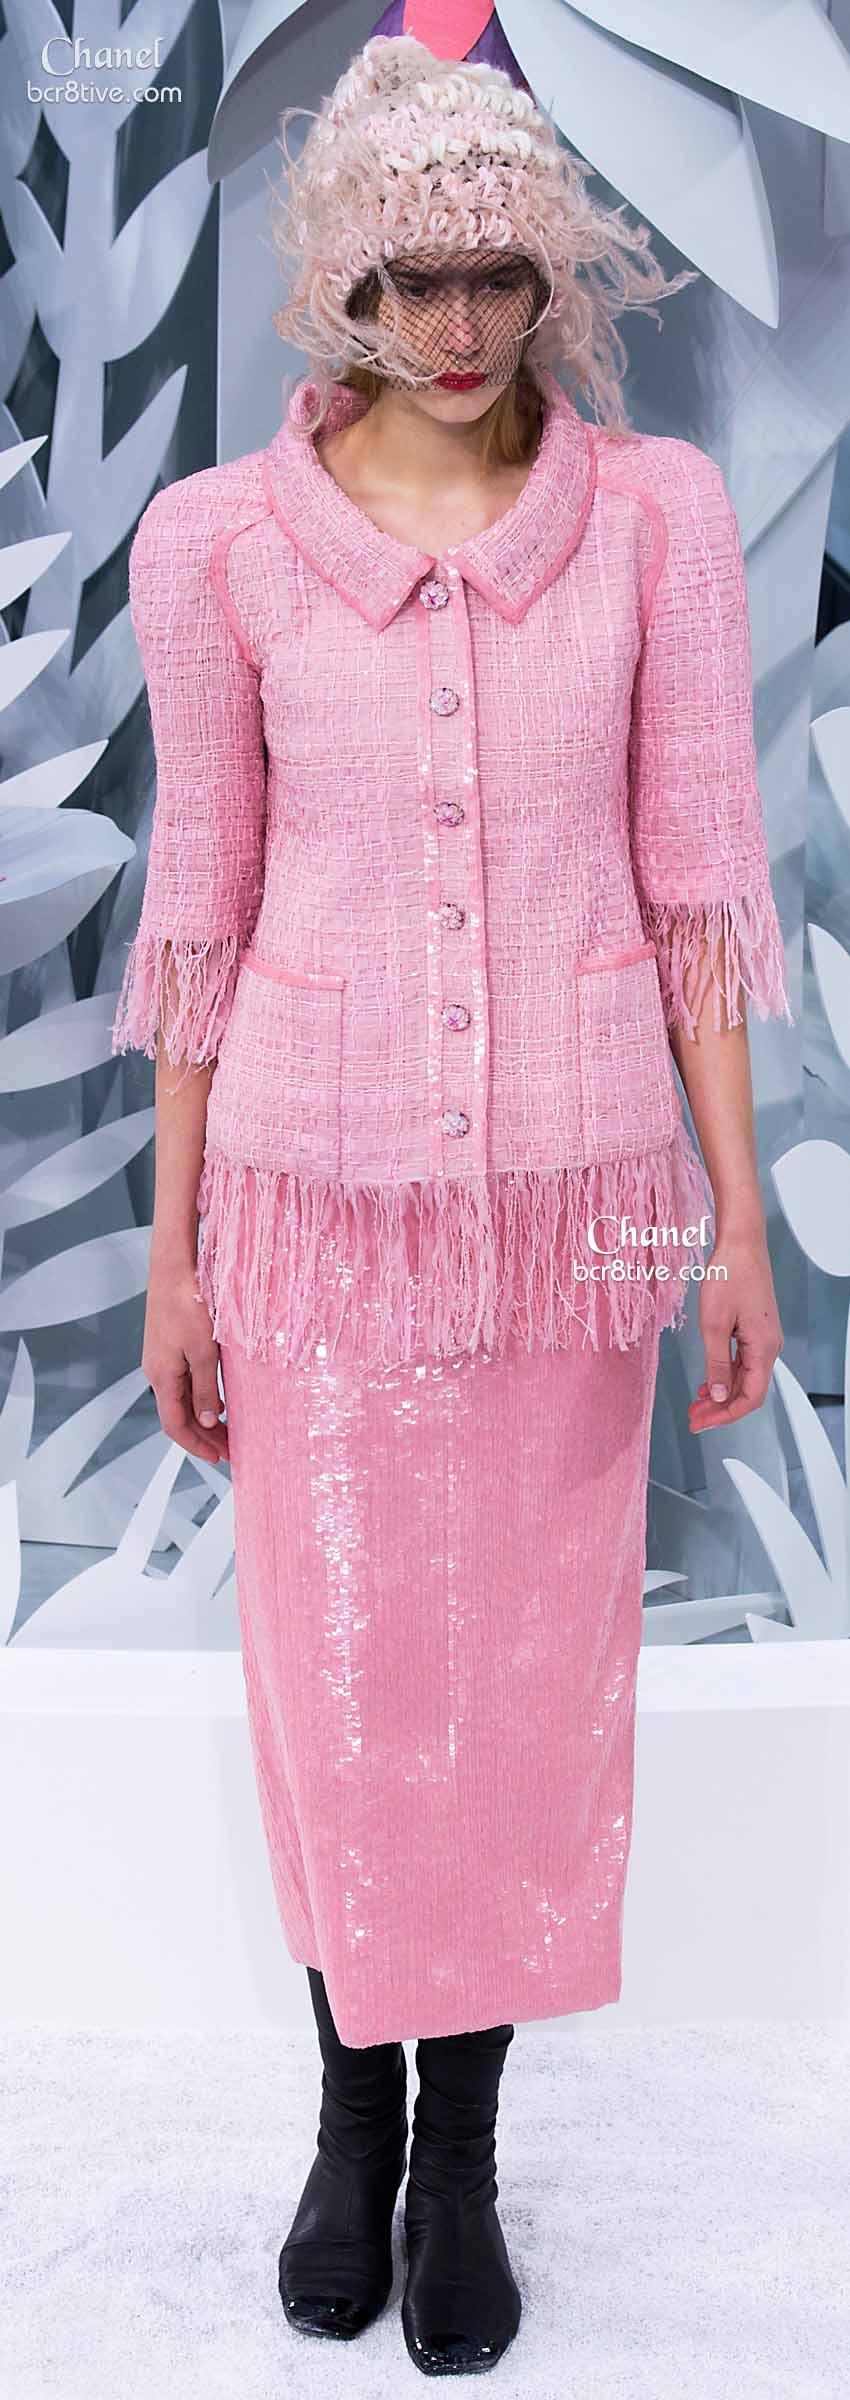 Chic in Pink & Fringe